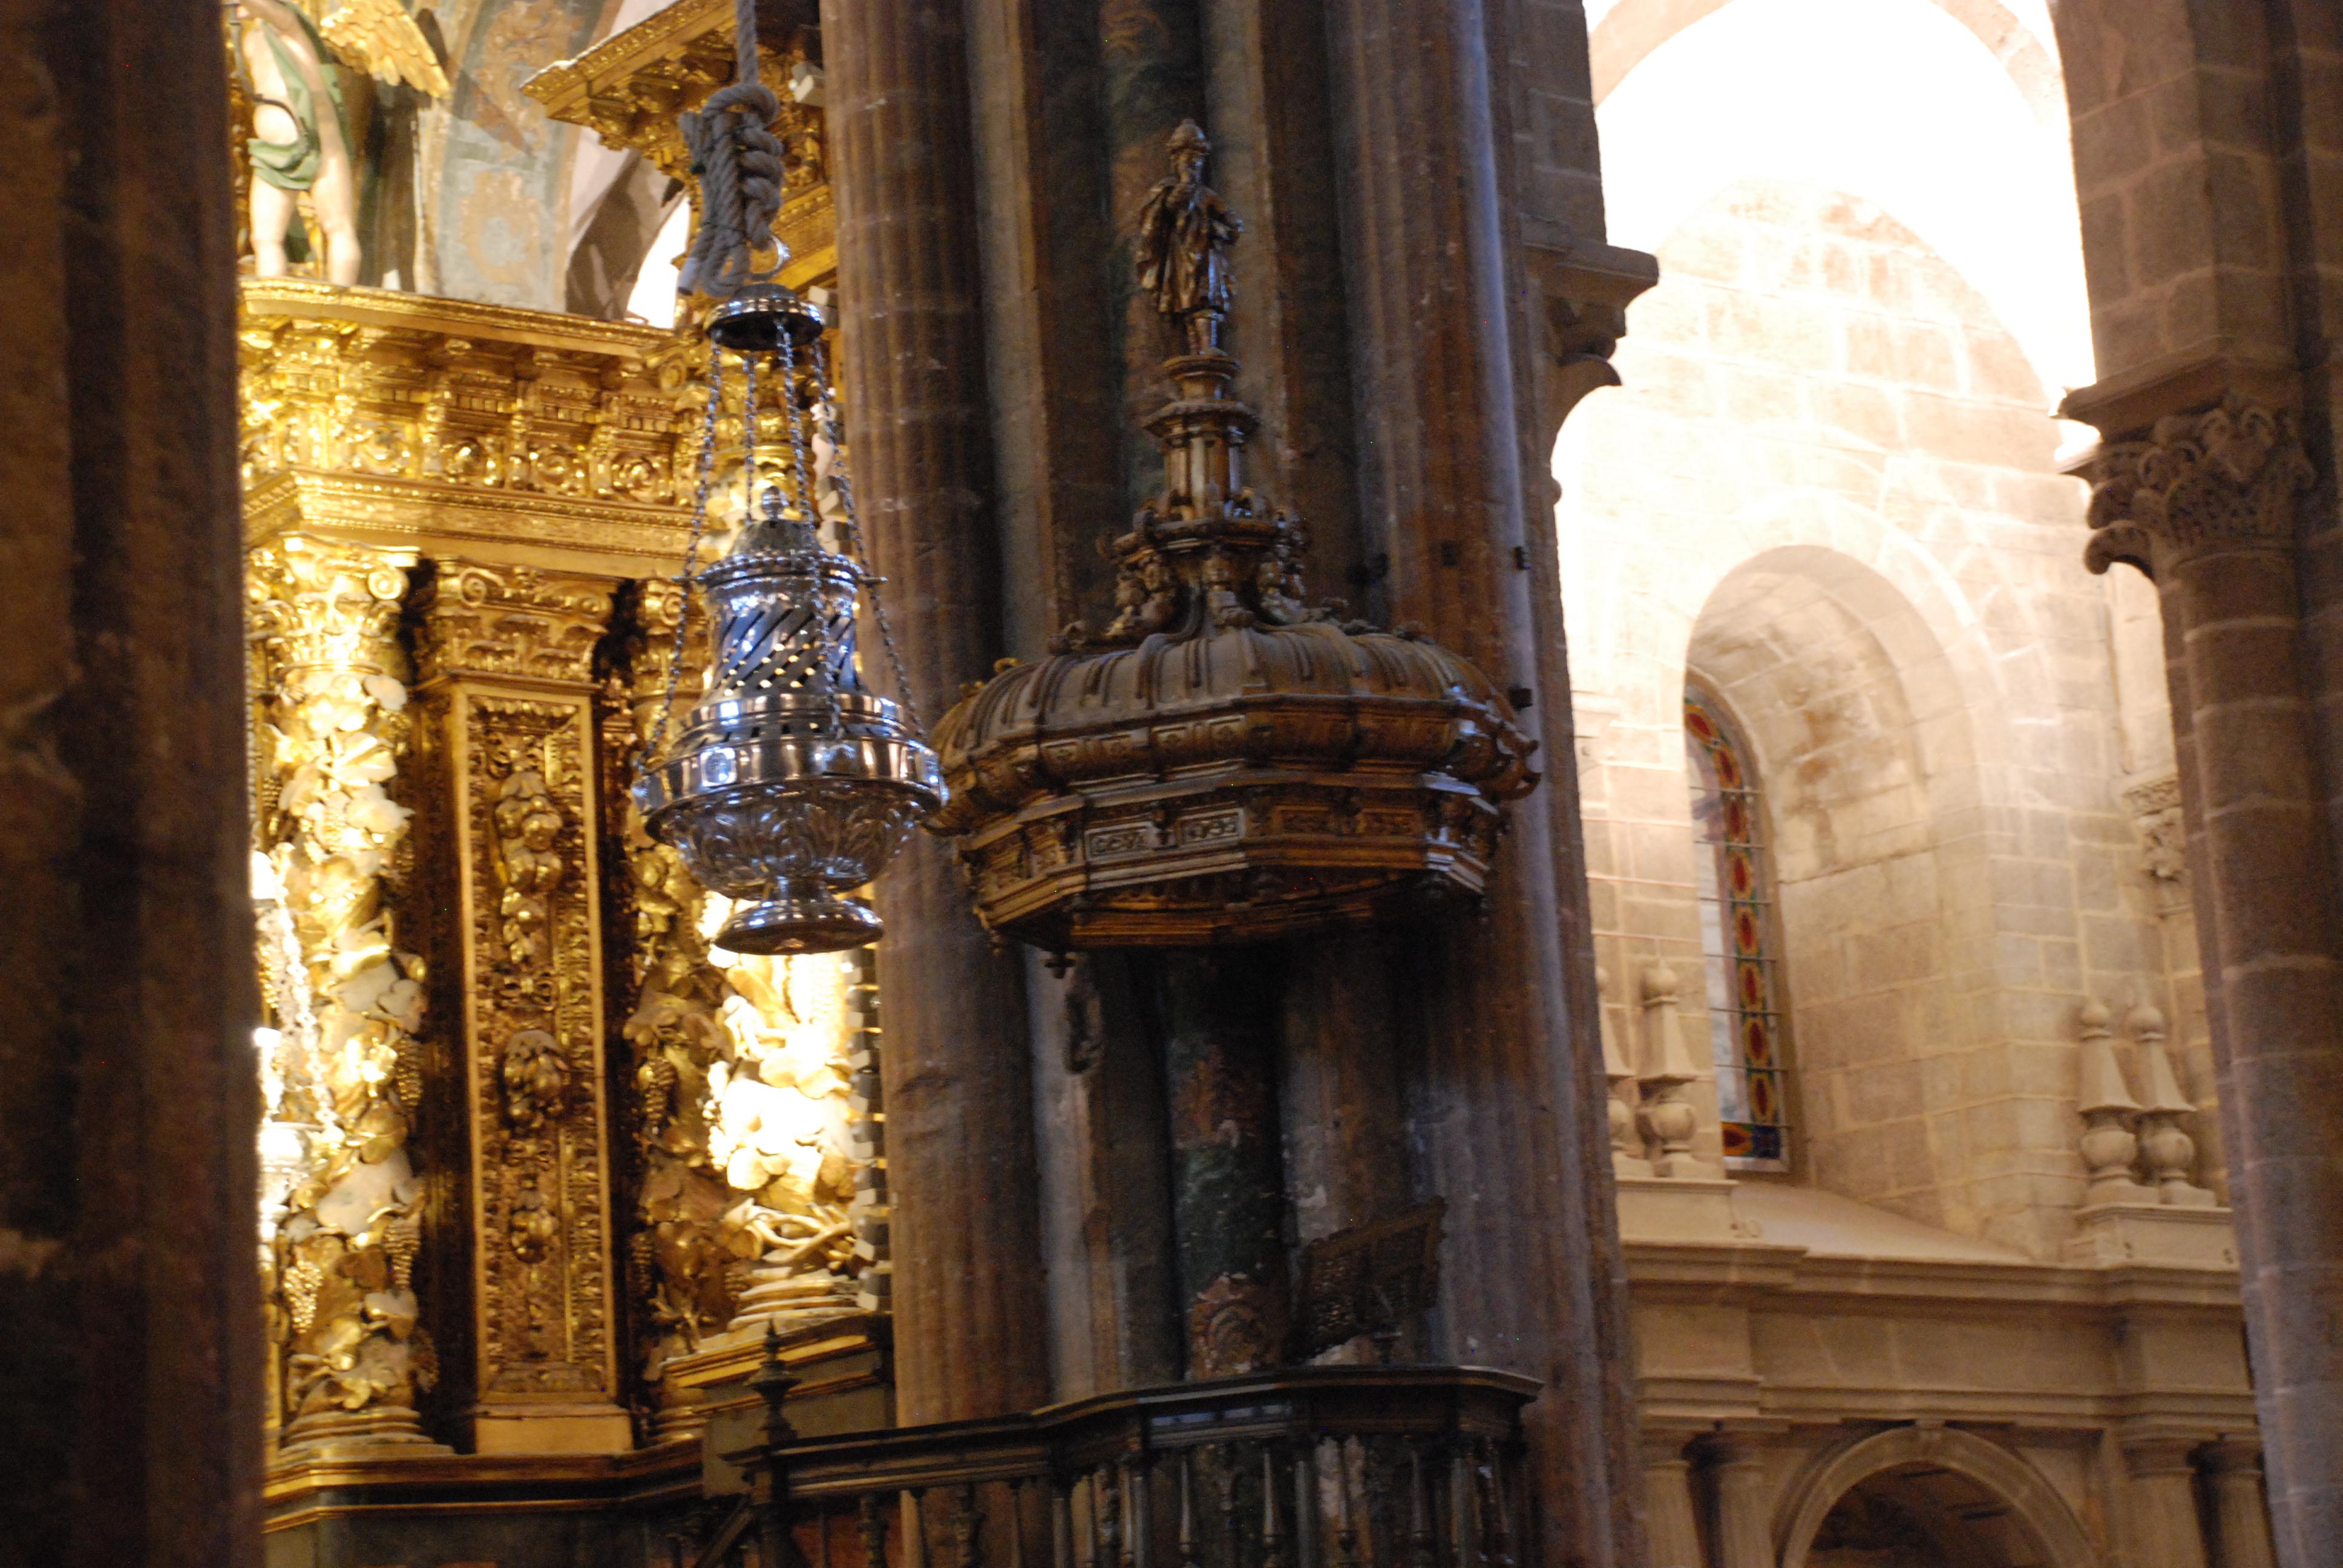 Botafumeiro at the pilgrim's mass, Santiago Cathedral